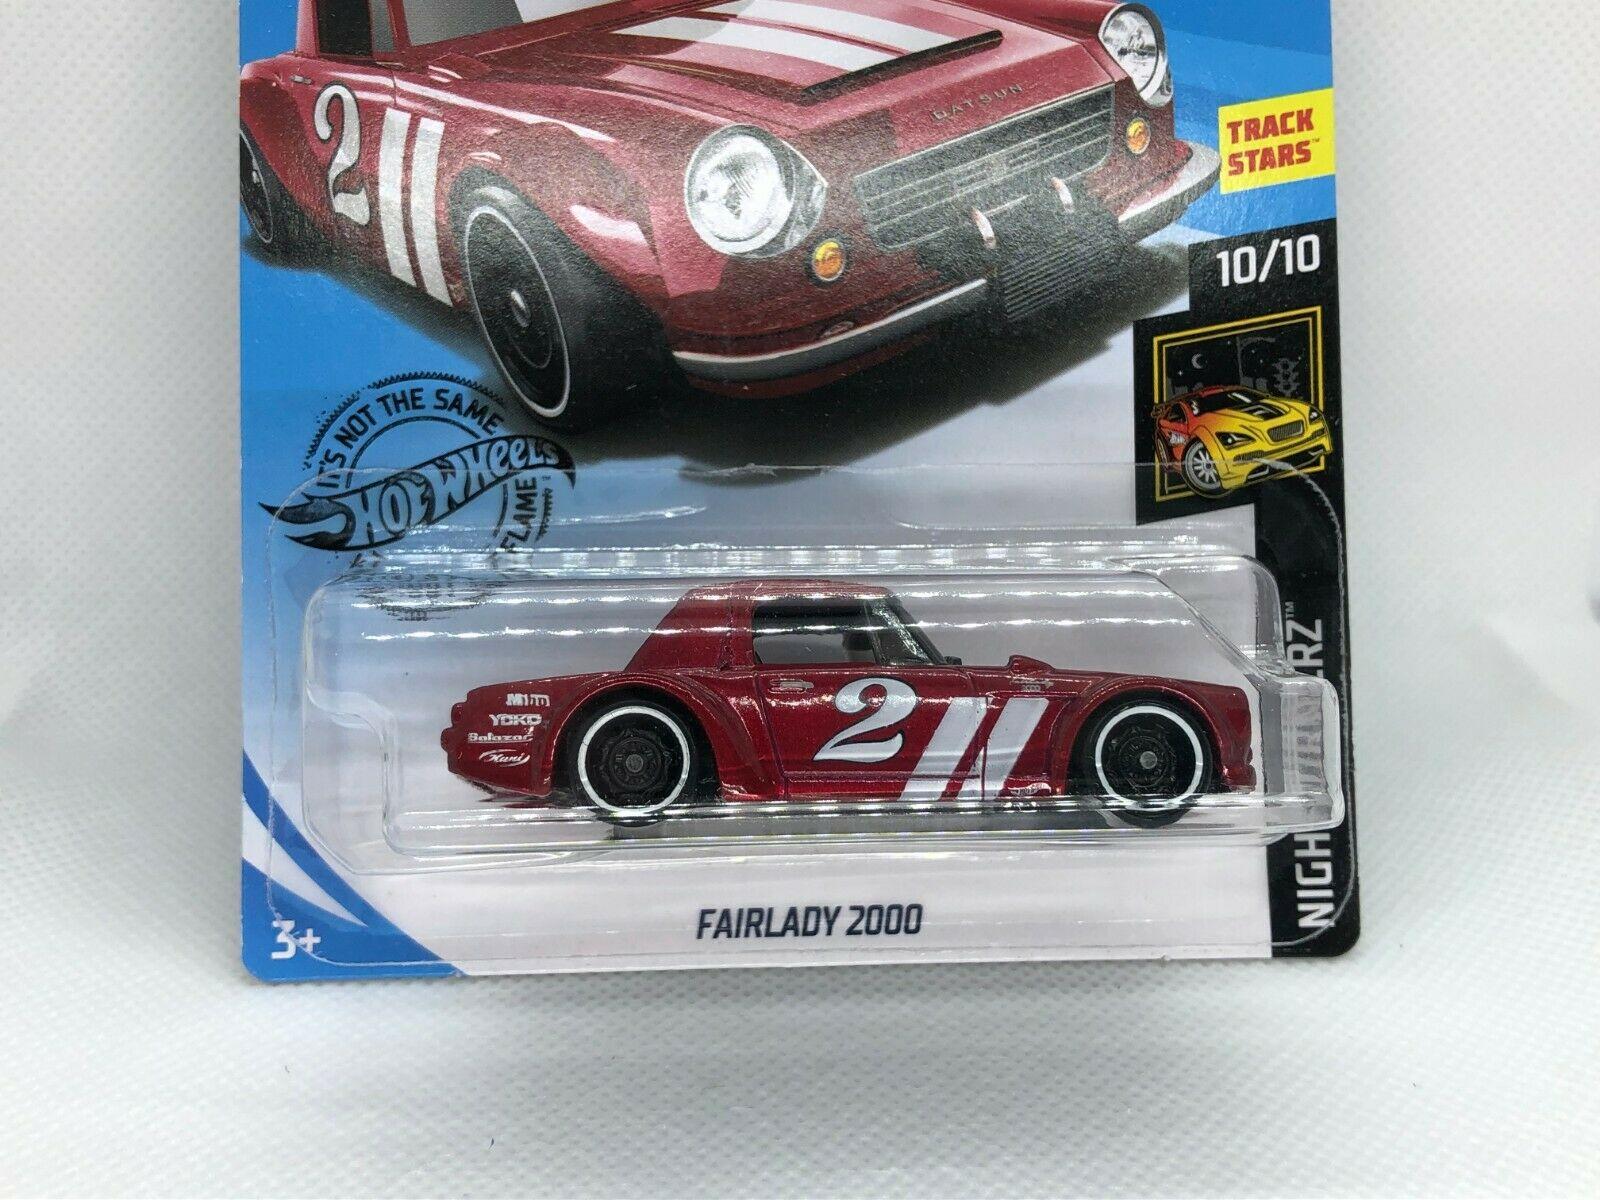 Fairlady 2000